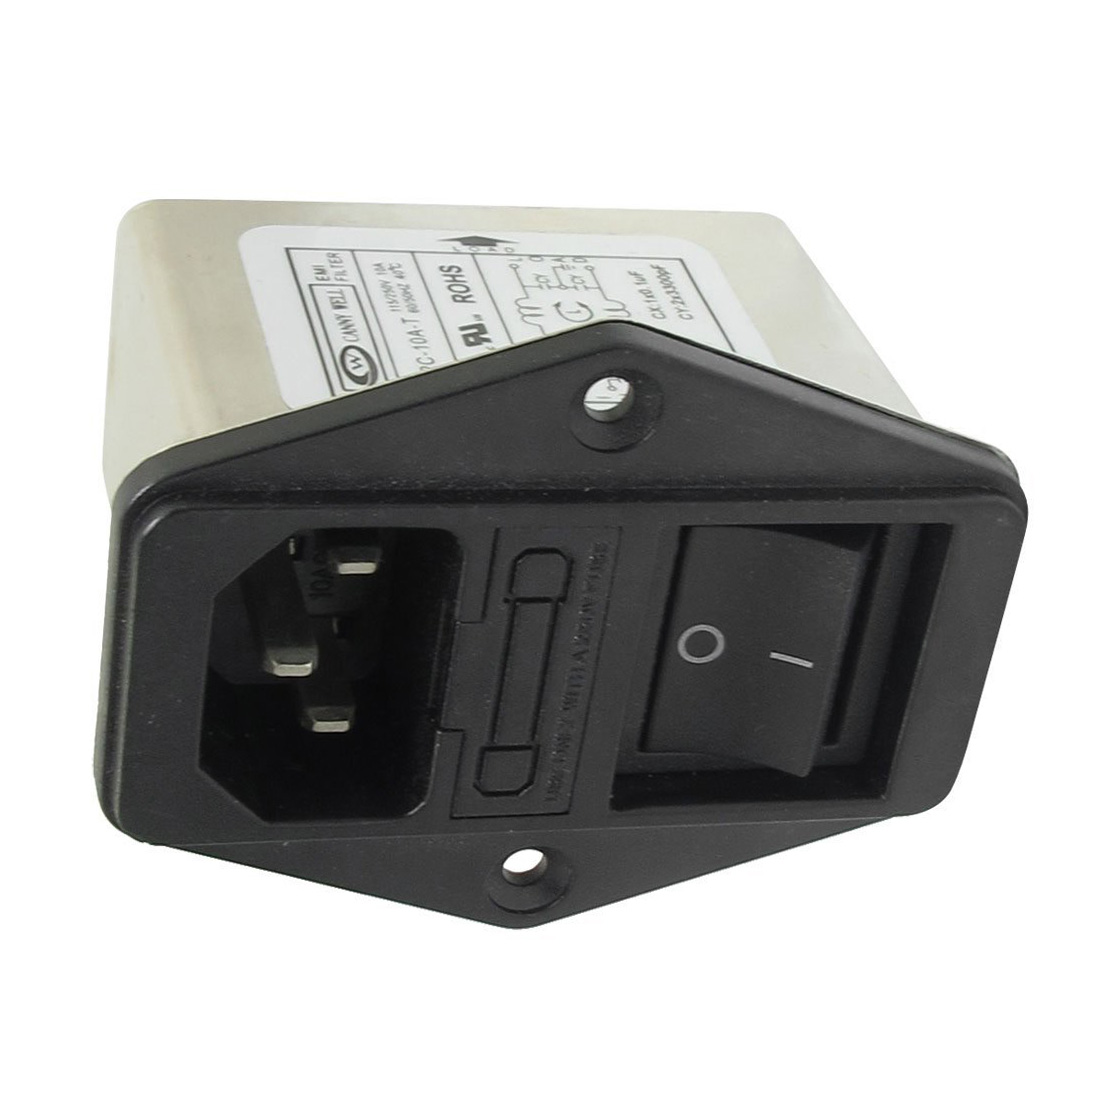 WSFS Heißer Lötösen IEC 320 C14 EMI Filter + Boot Schalter + Sicherungshalter